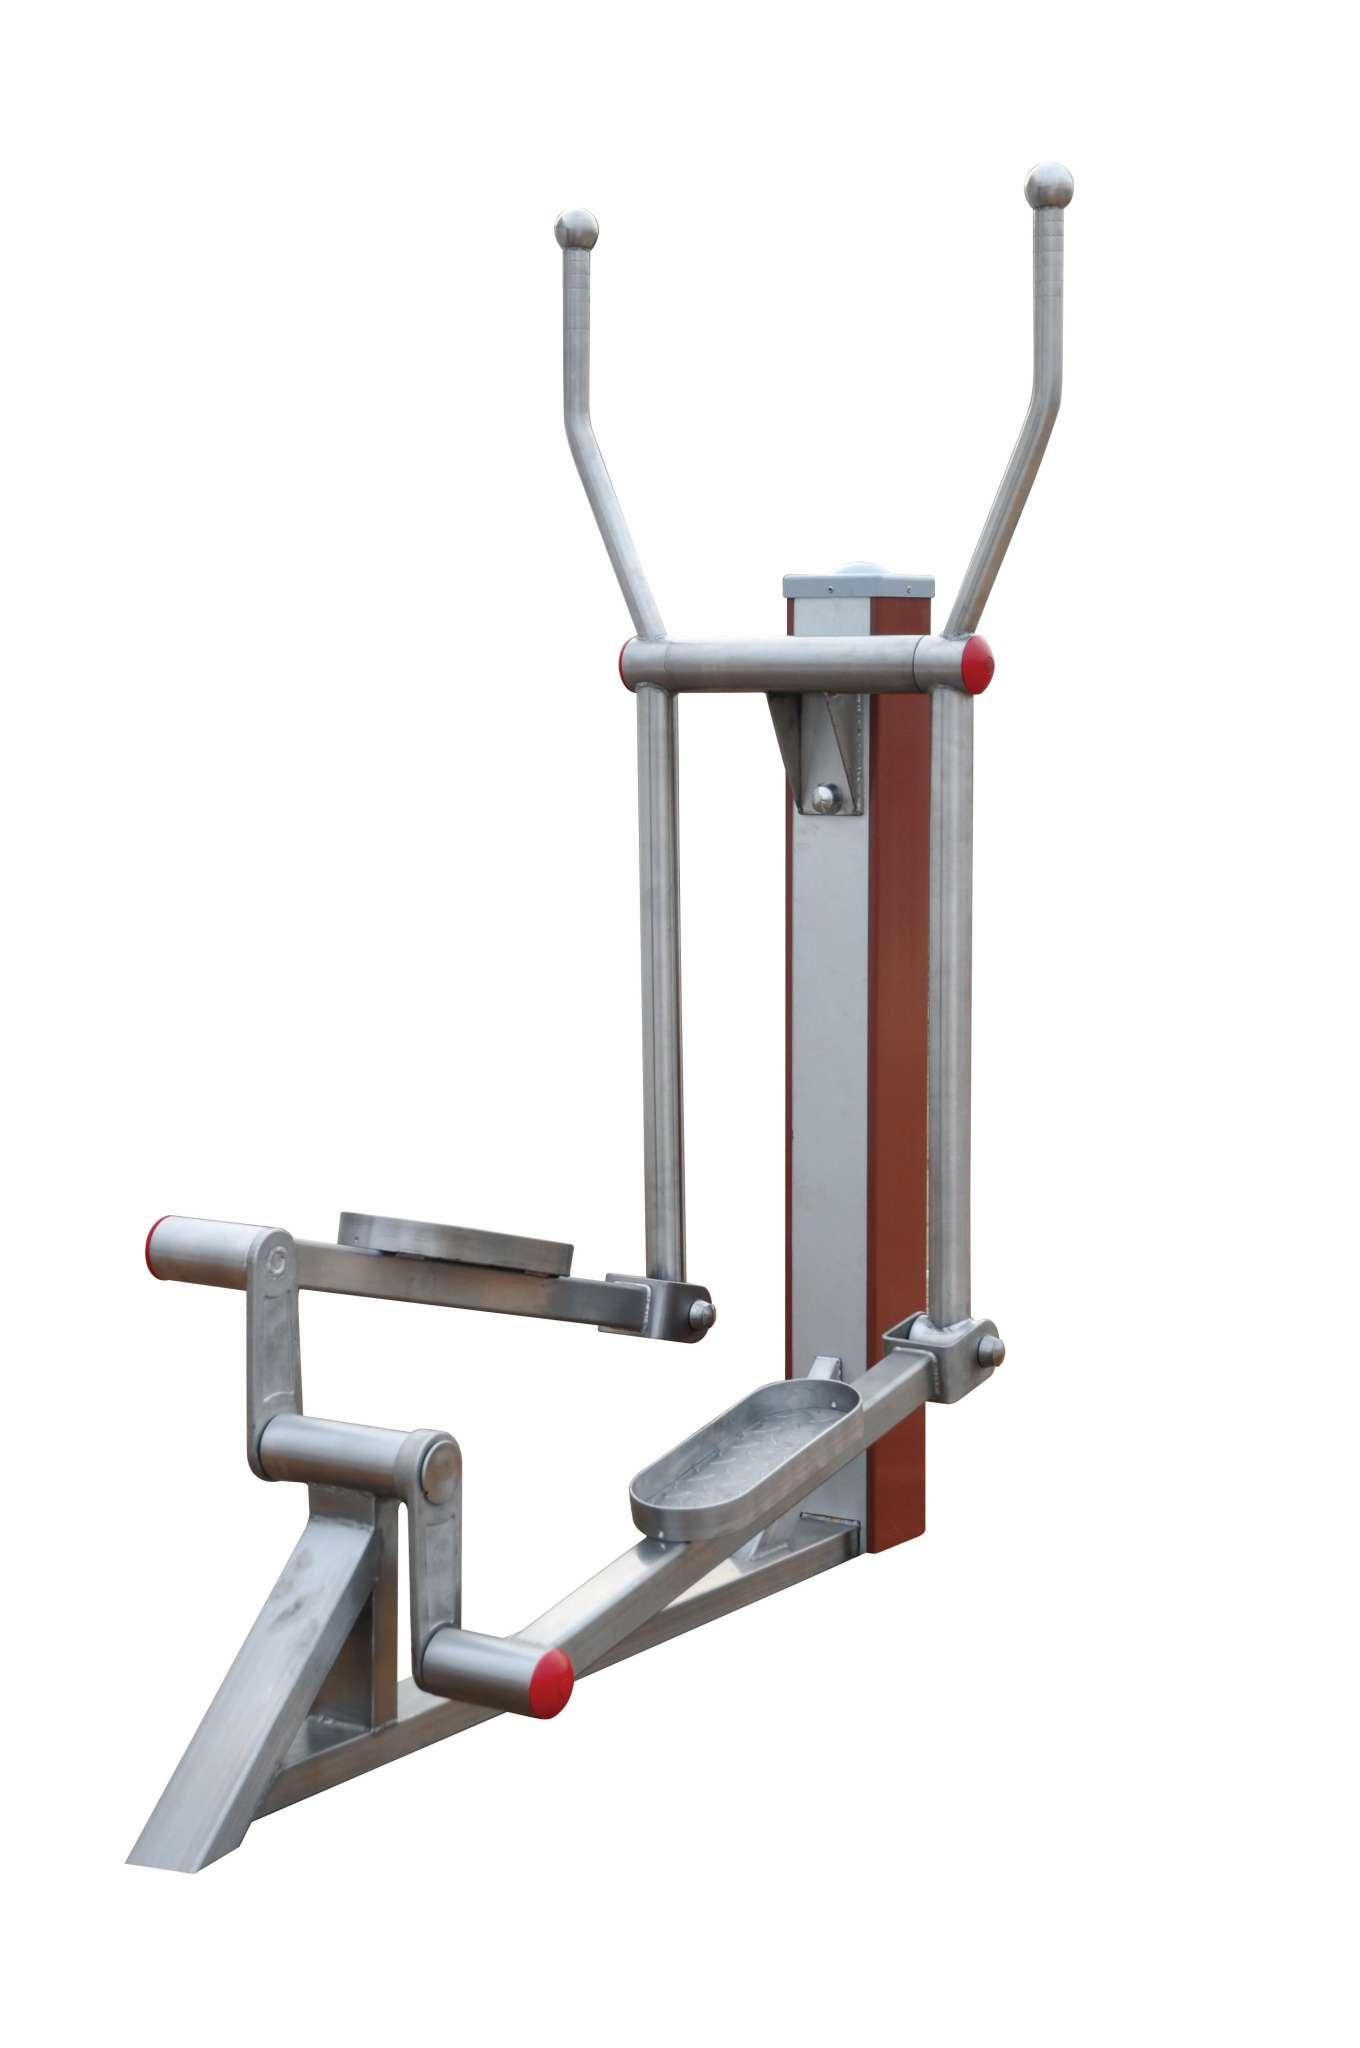 l 占地空间:13666801546(mm) l 锻炼方法:两脚踏于踏板上,两手紧握手柄,脚与手协调动作,使脚踏板转动,手把摆动,进行椭圆漫步运动。 l 主要功能:增强上肢肌肉耐力和四肢协调能力。 l 注意事项: 1、器材前后严禁站人,严禁器材运动时上下人员; 2、锻炼时必须专心致志,紧握手柄; 3、儿童或不具备独立操作能力的人,锻炼时必须有成人监护。 l 通过NSCC国体认证